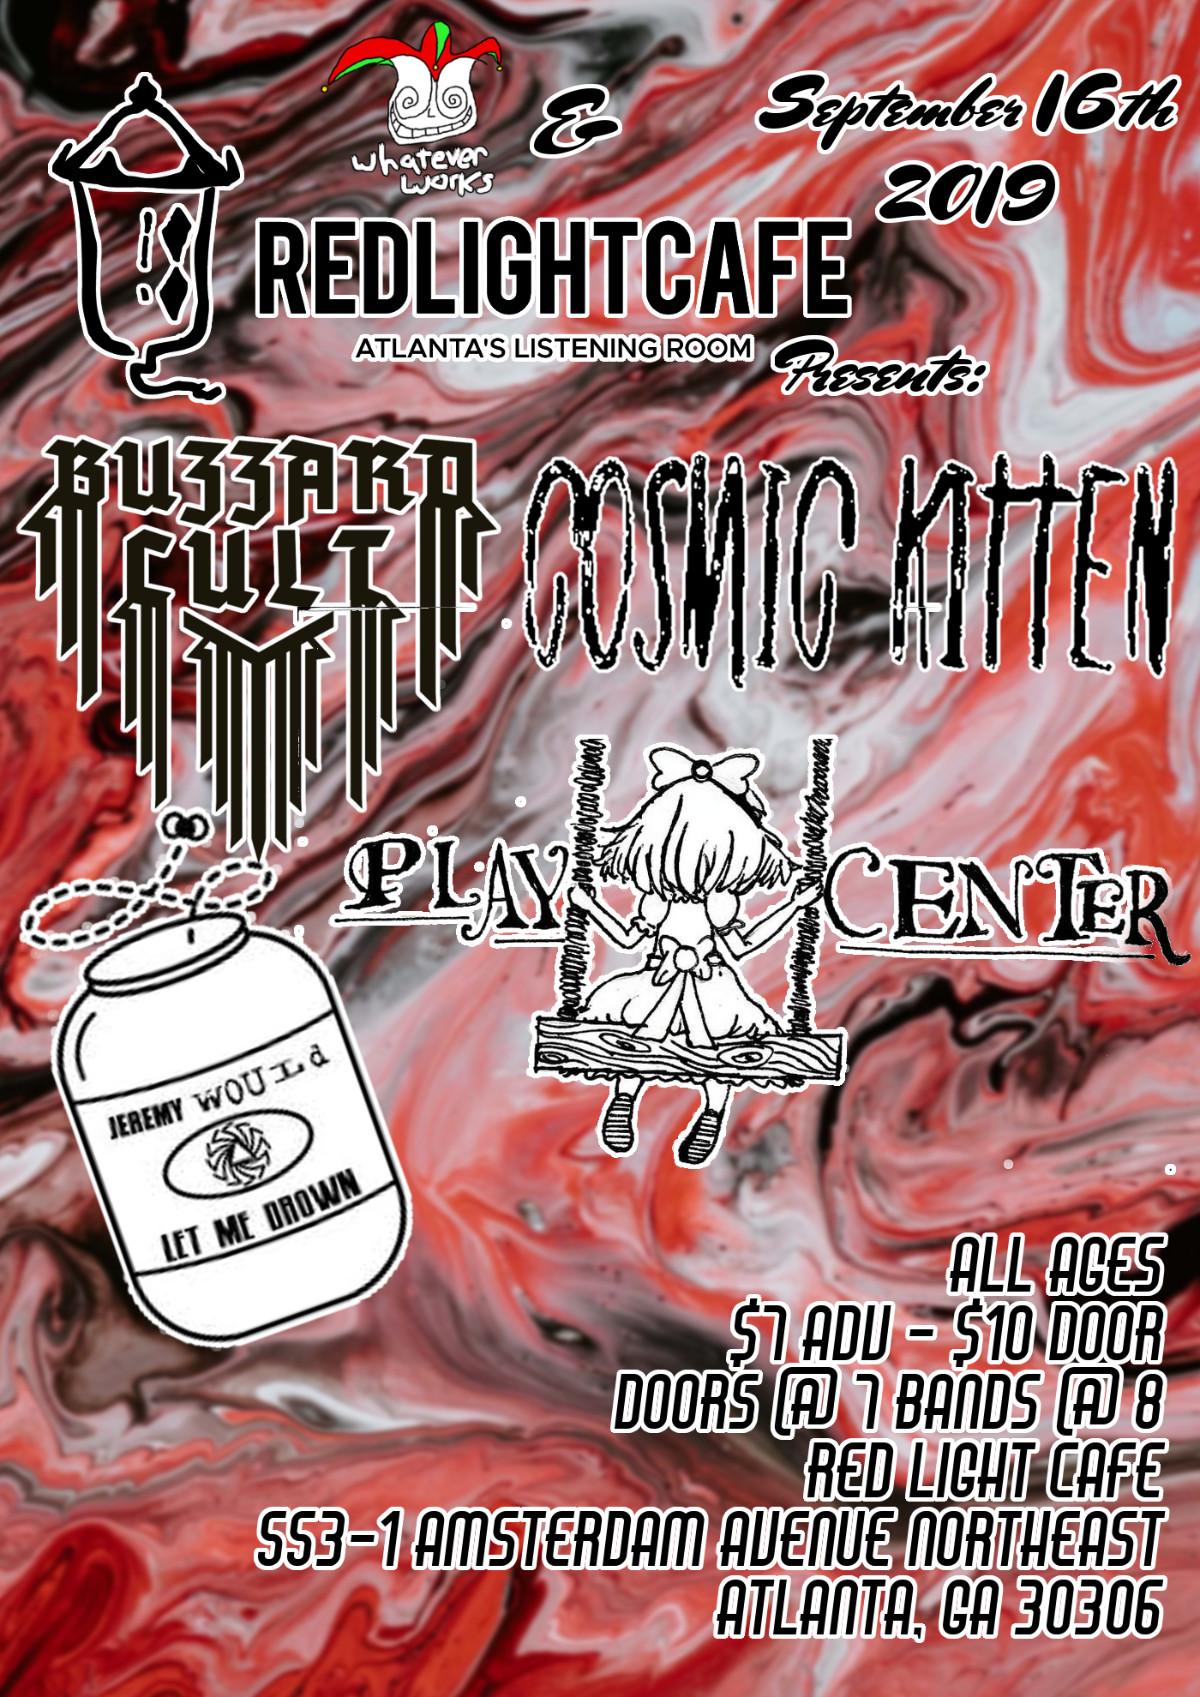 Play Center + Jeremy Would Let Me Drown + Cosmic Kitten + Buzzard Cult — September 16, 2019 — Red Light Café, Atlanta, GA